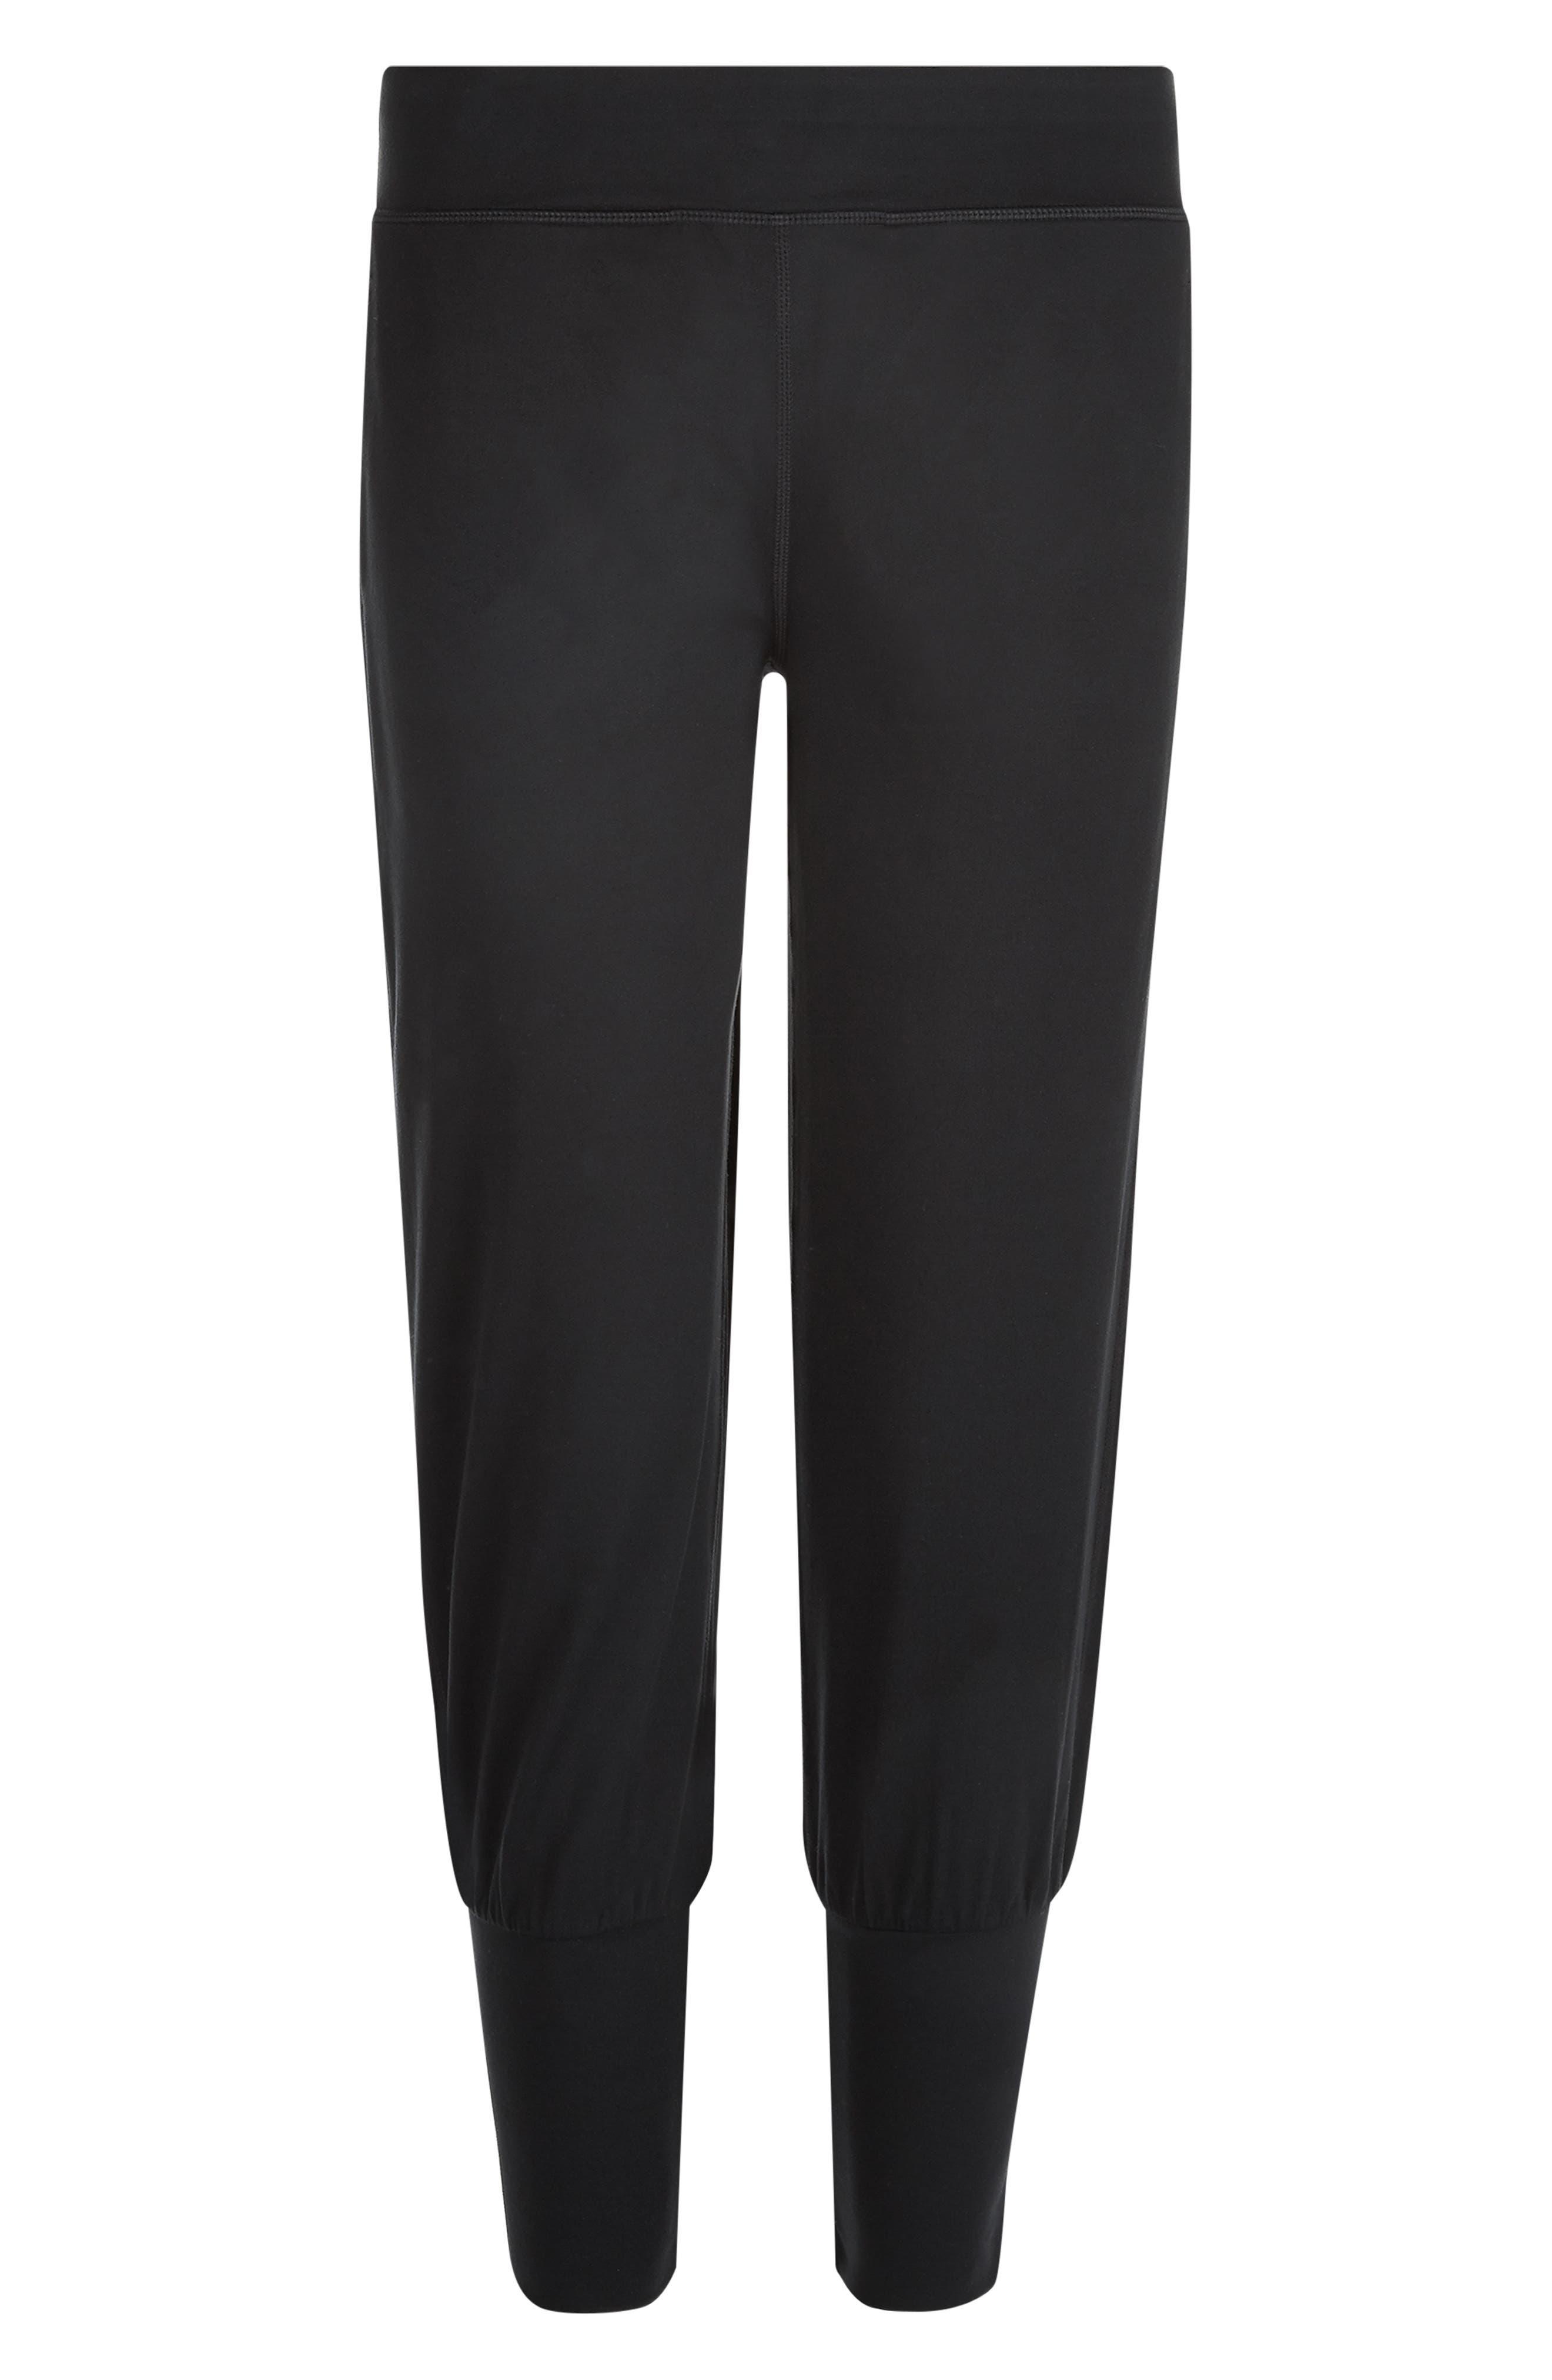 SWEATY BETTY, Garudasana Crop Yoga Trousers, Alternate thumbnail 7, color, BLACK